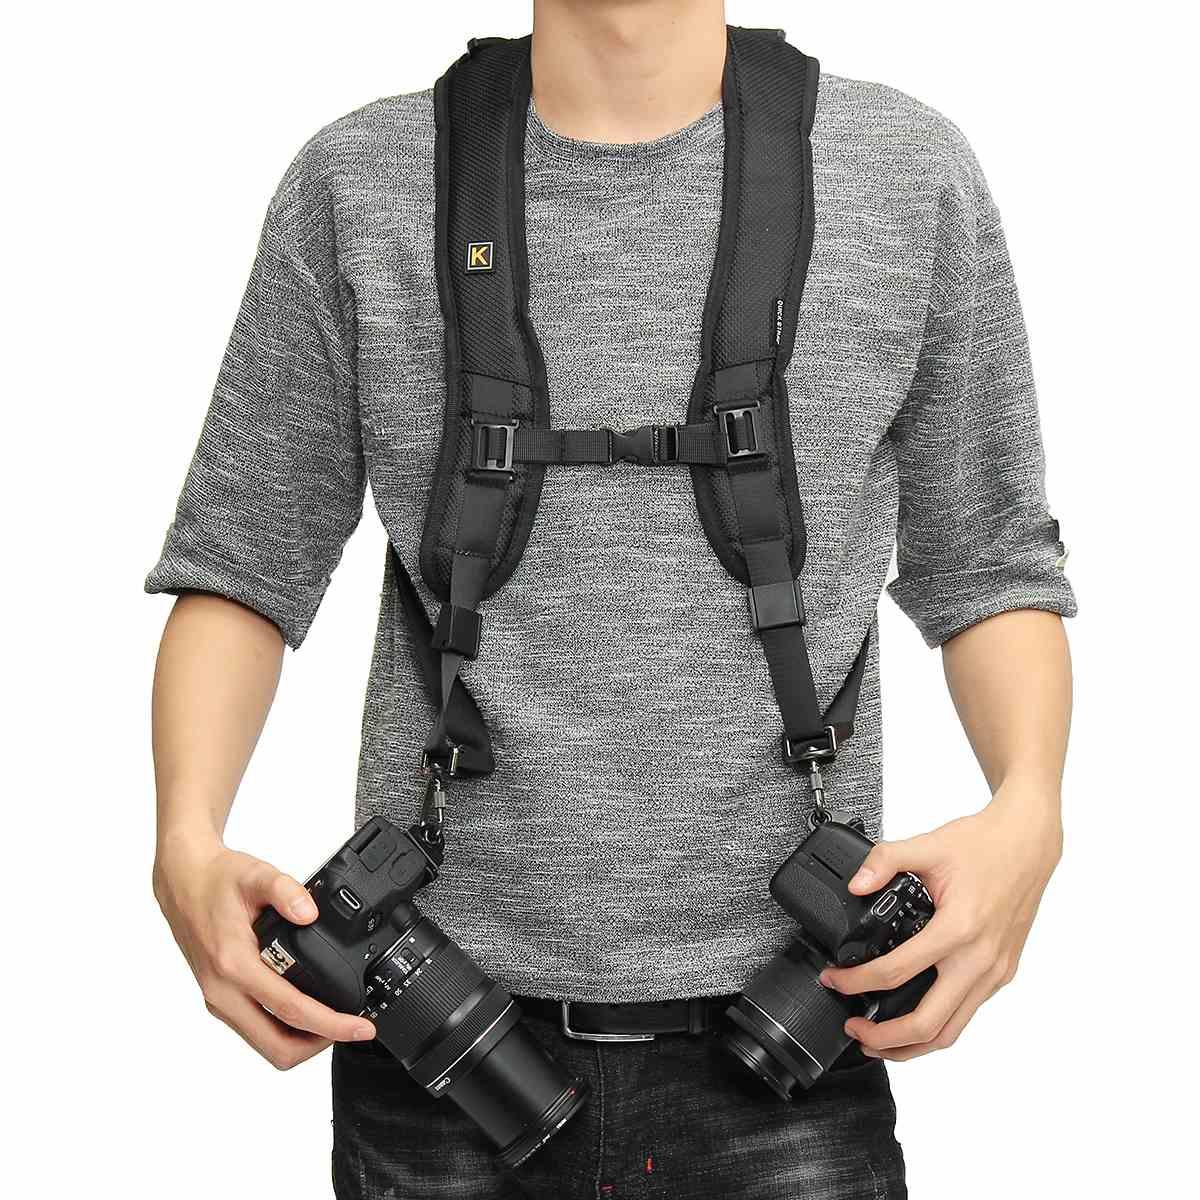 Quick Rapid Camera Double Dual Shoulder Sling Belt Strap For Nikon For Sony For Canon SLR Camera Shoulder Strap